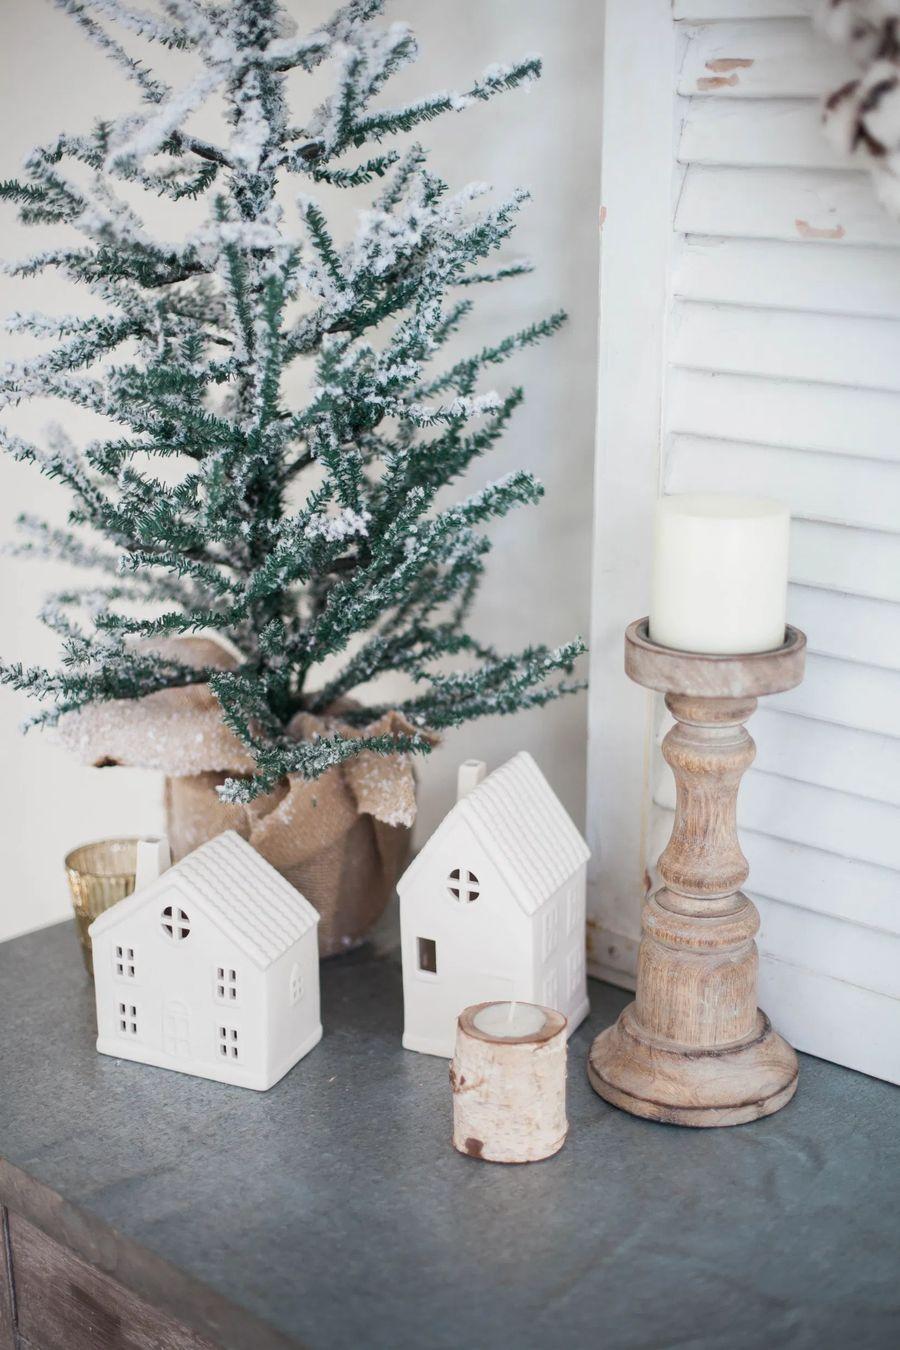 Evergreen tree and winter white houses via laurenmcbrideblog